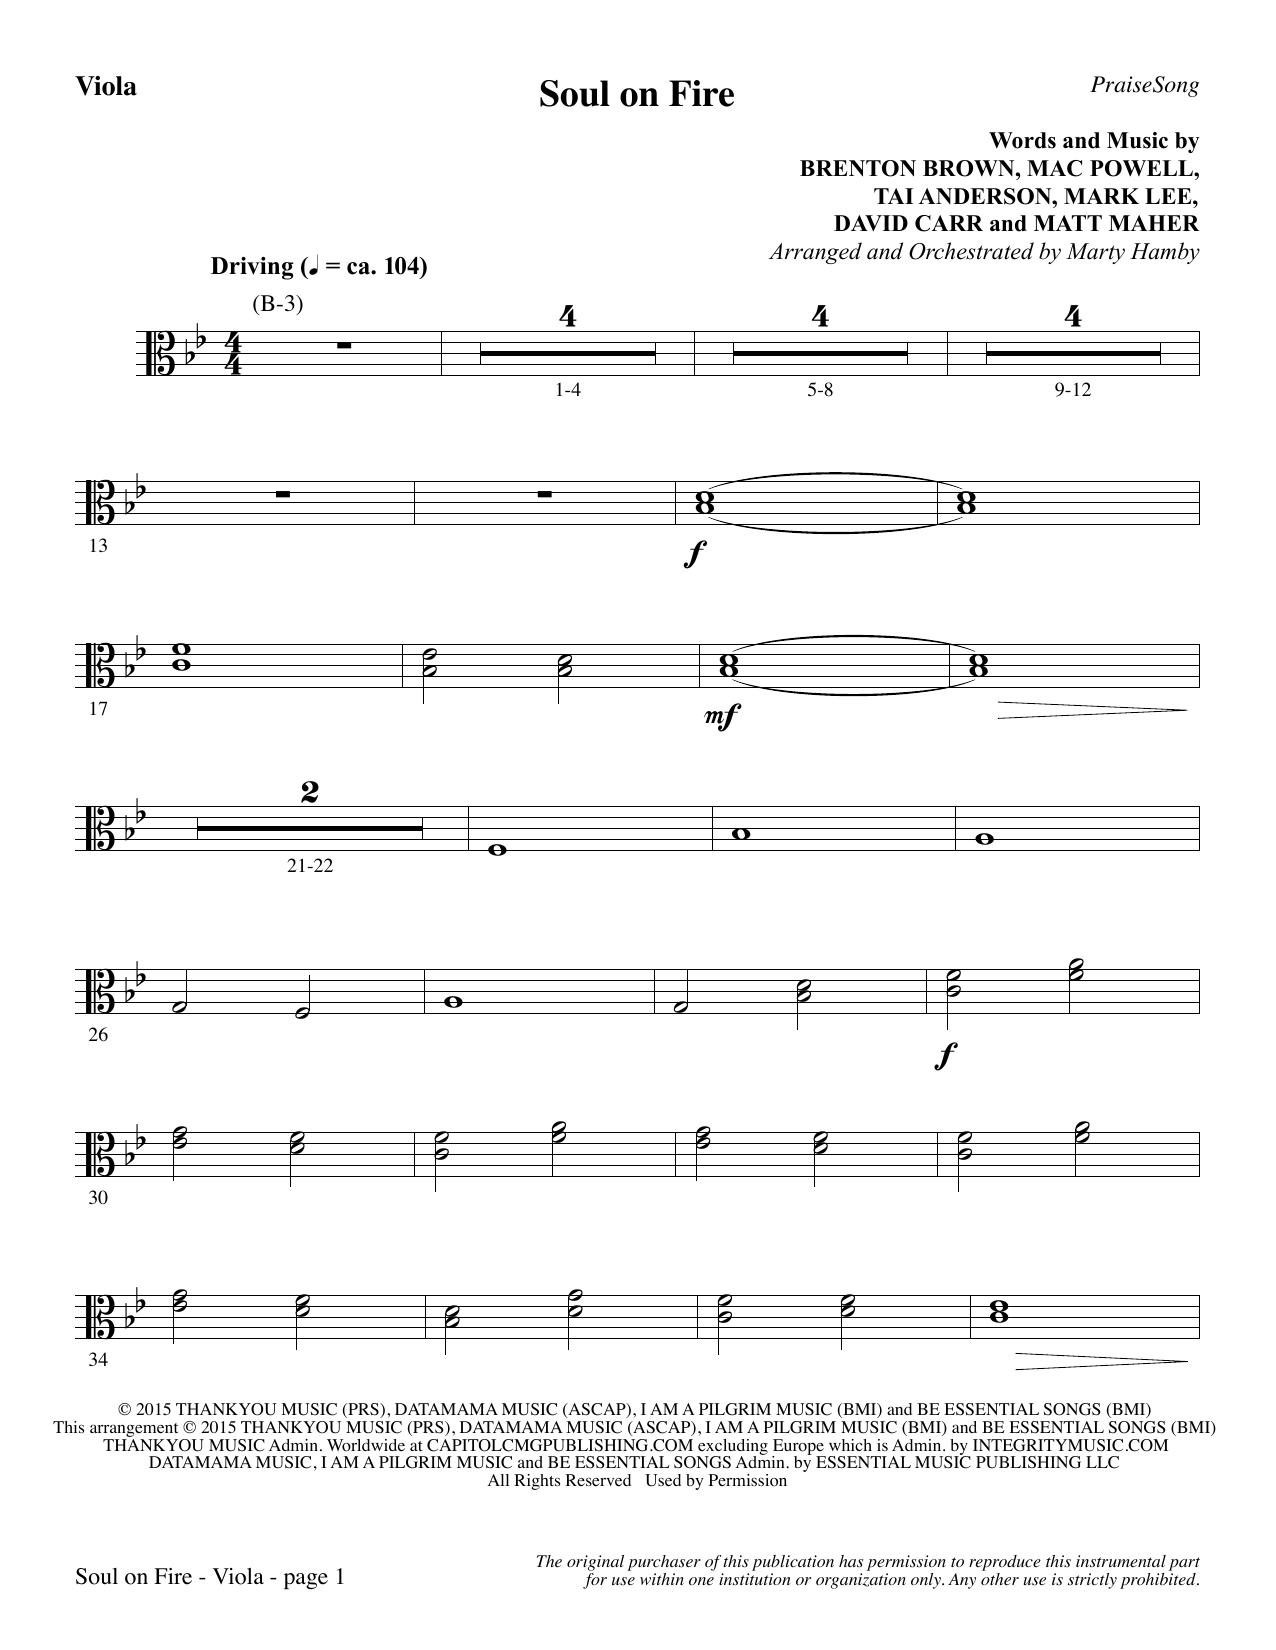 Soul on Fire - Viola sheet music